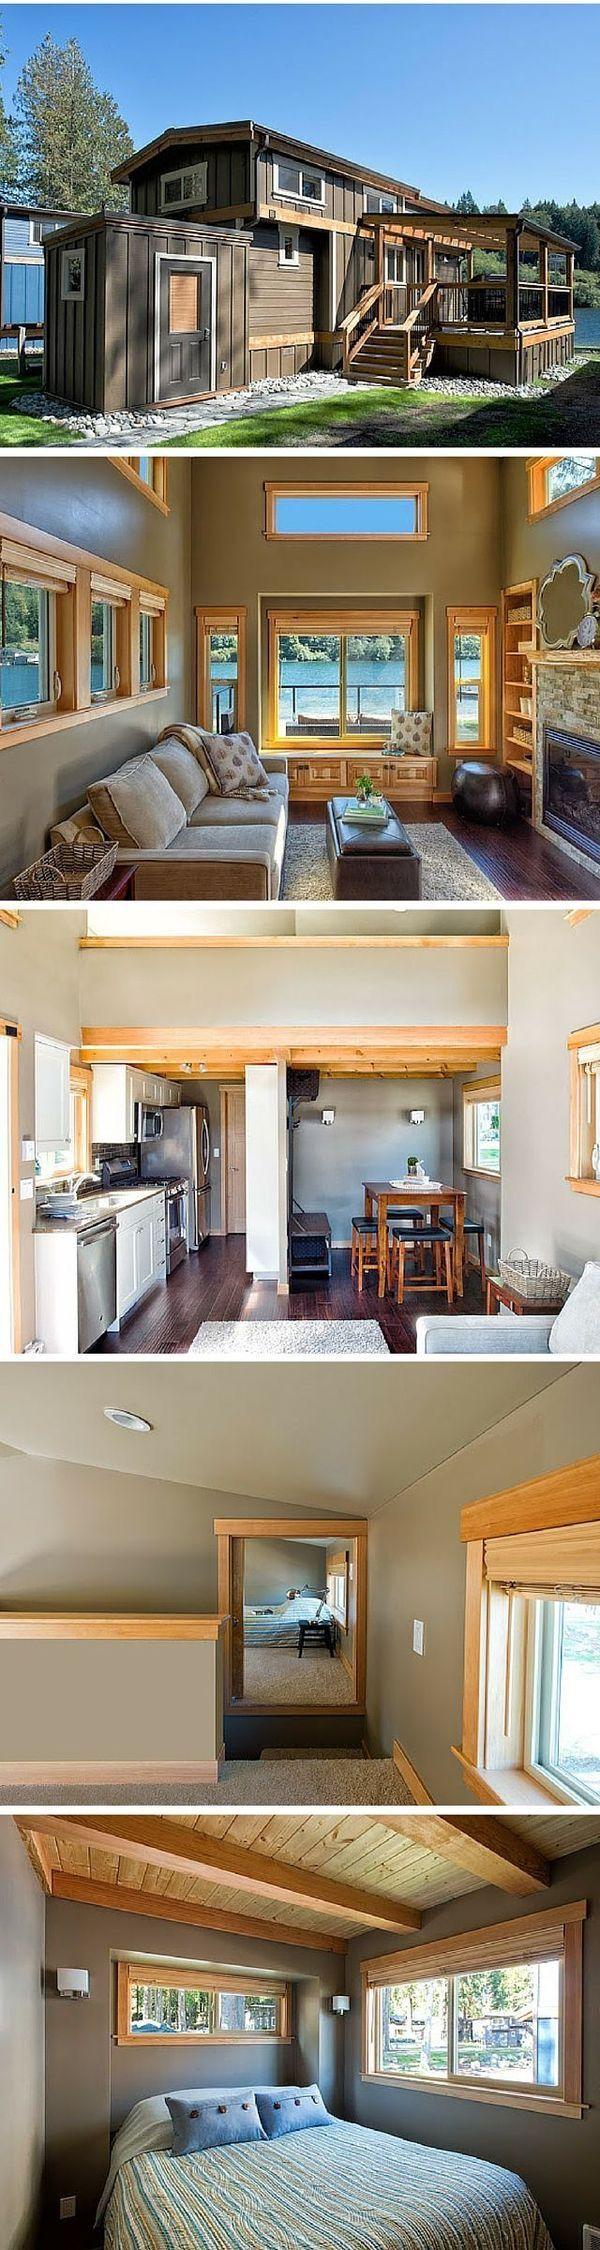 Pin von Melissa Pate auf Tiny Houses | Pinterest | Mini-häuser ...